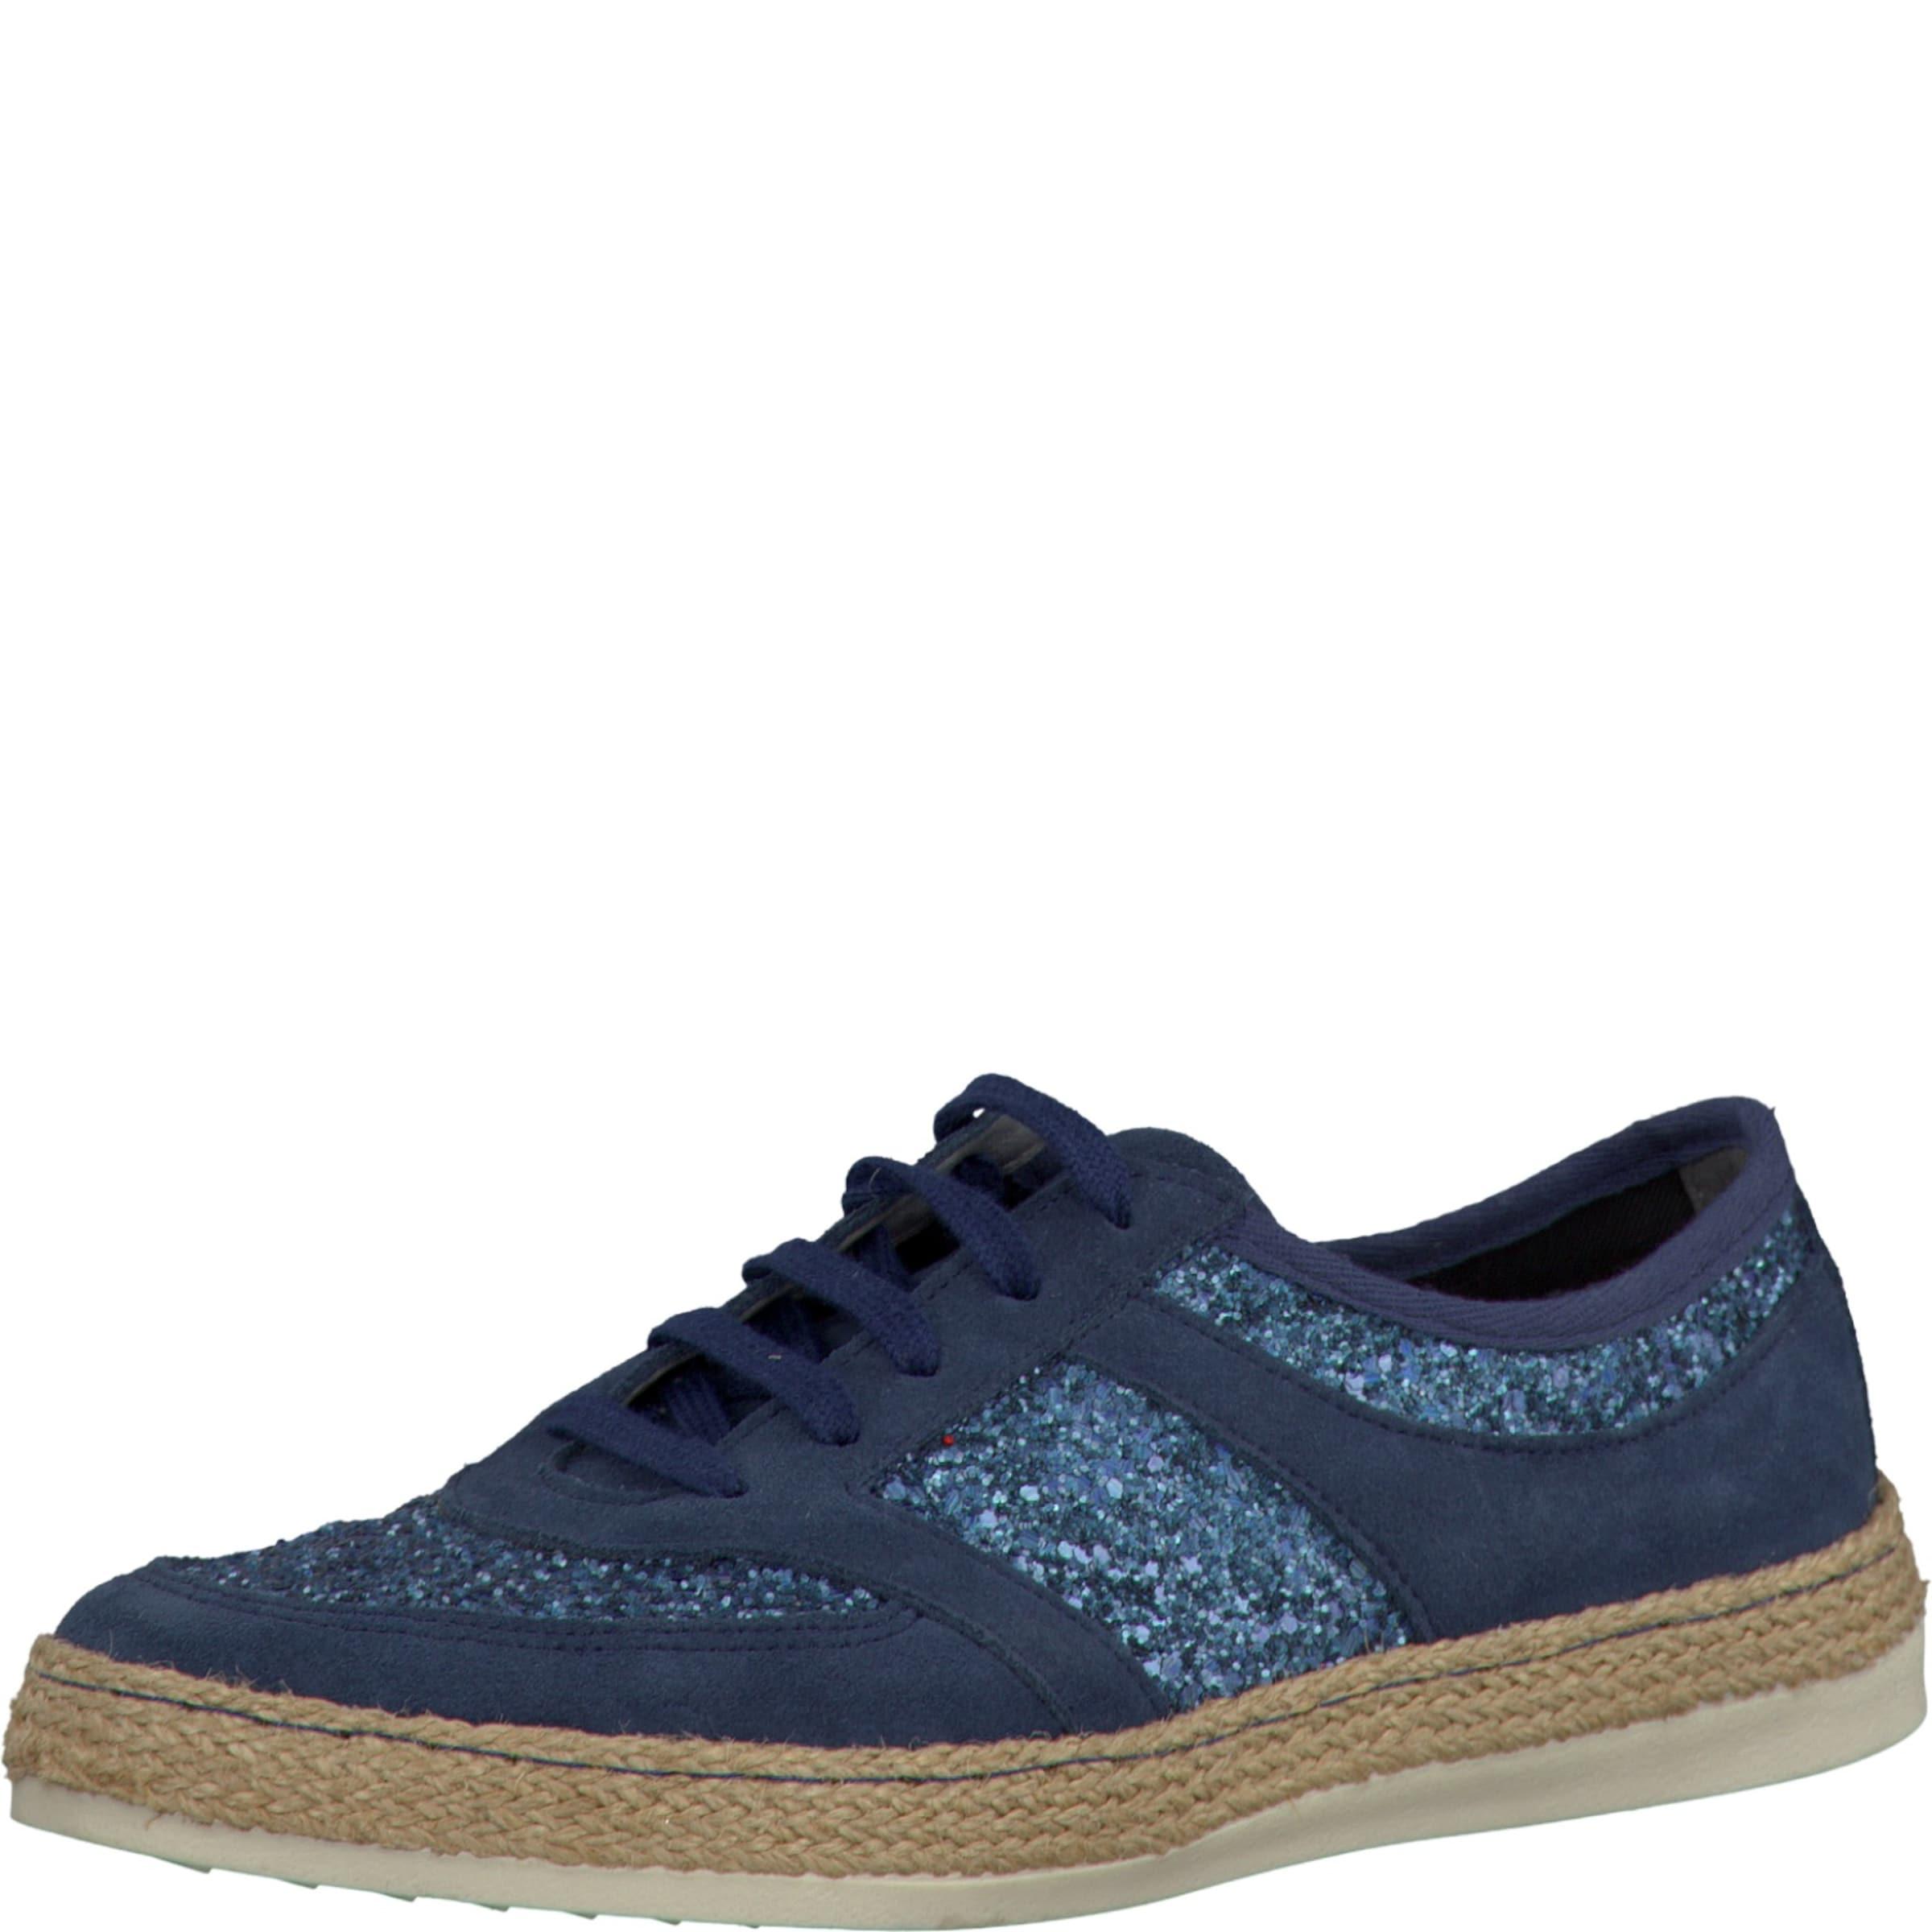 TAMARIS Deusa Sneaker Verschleißfeste billige Schuhe